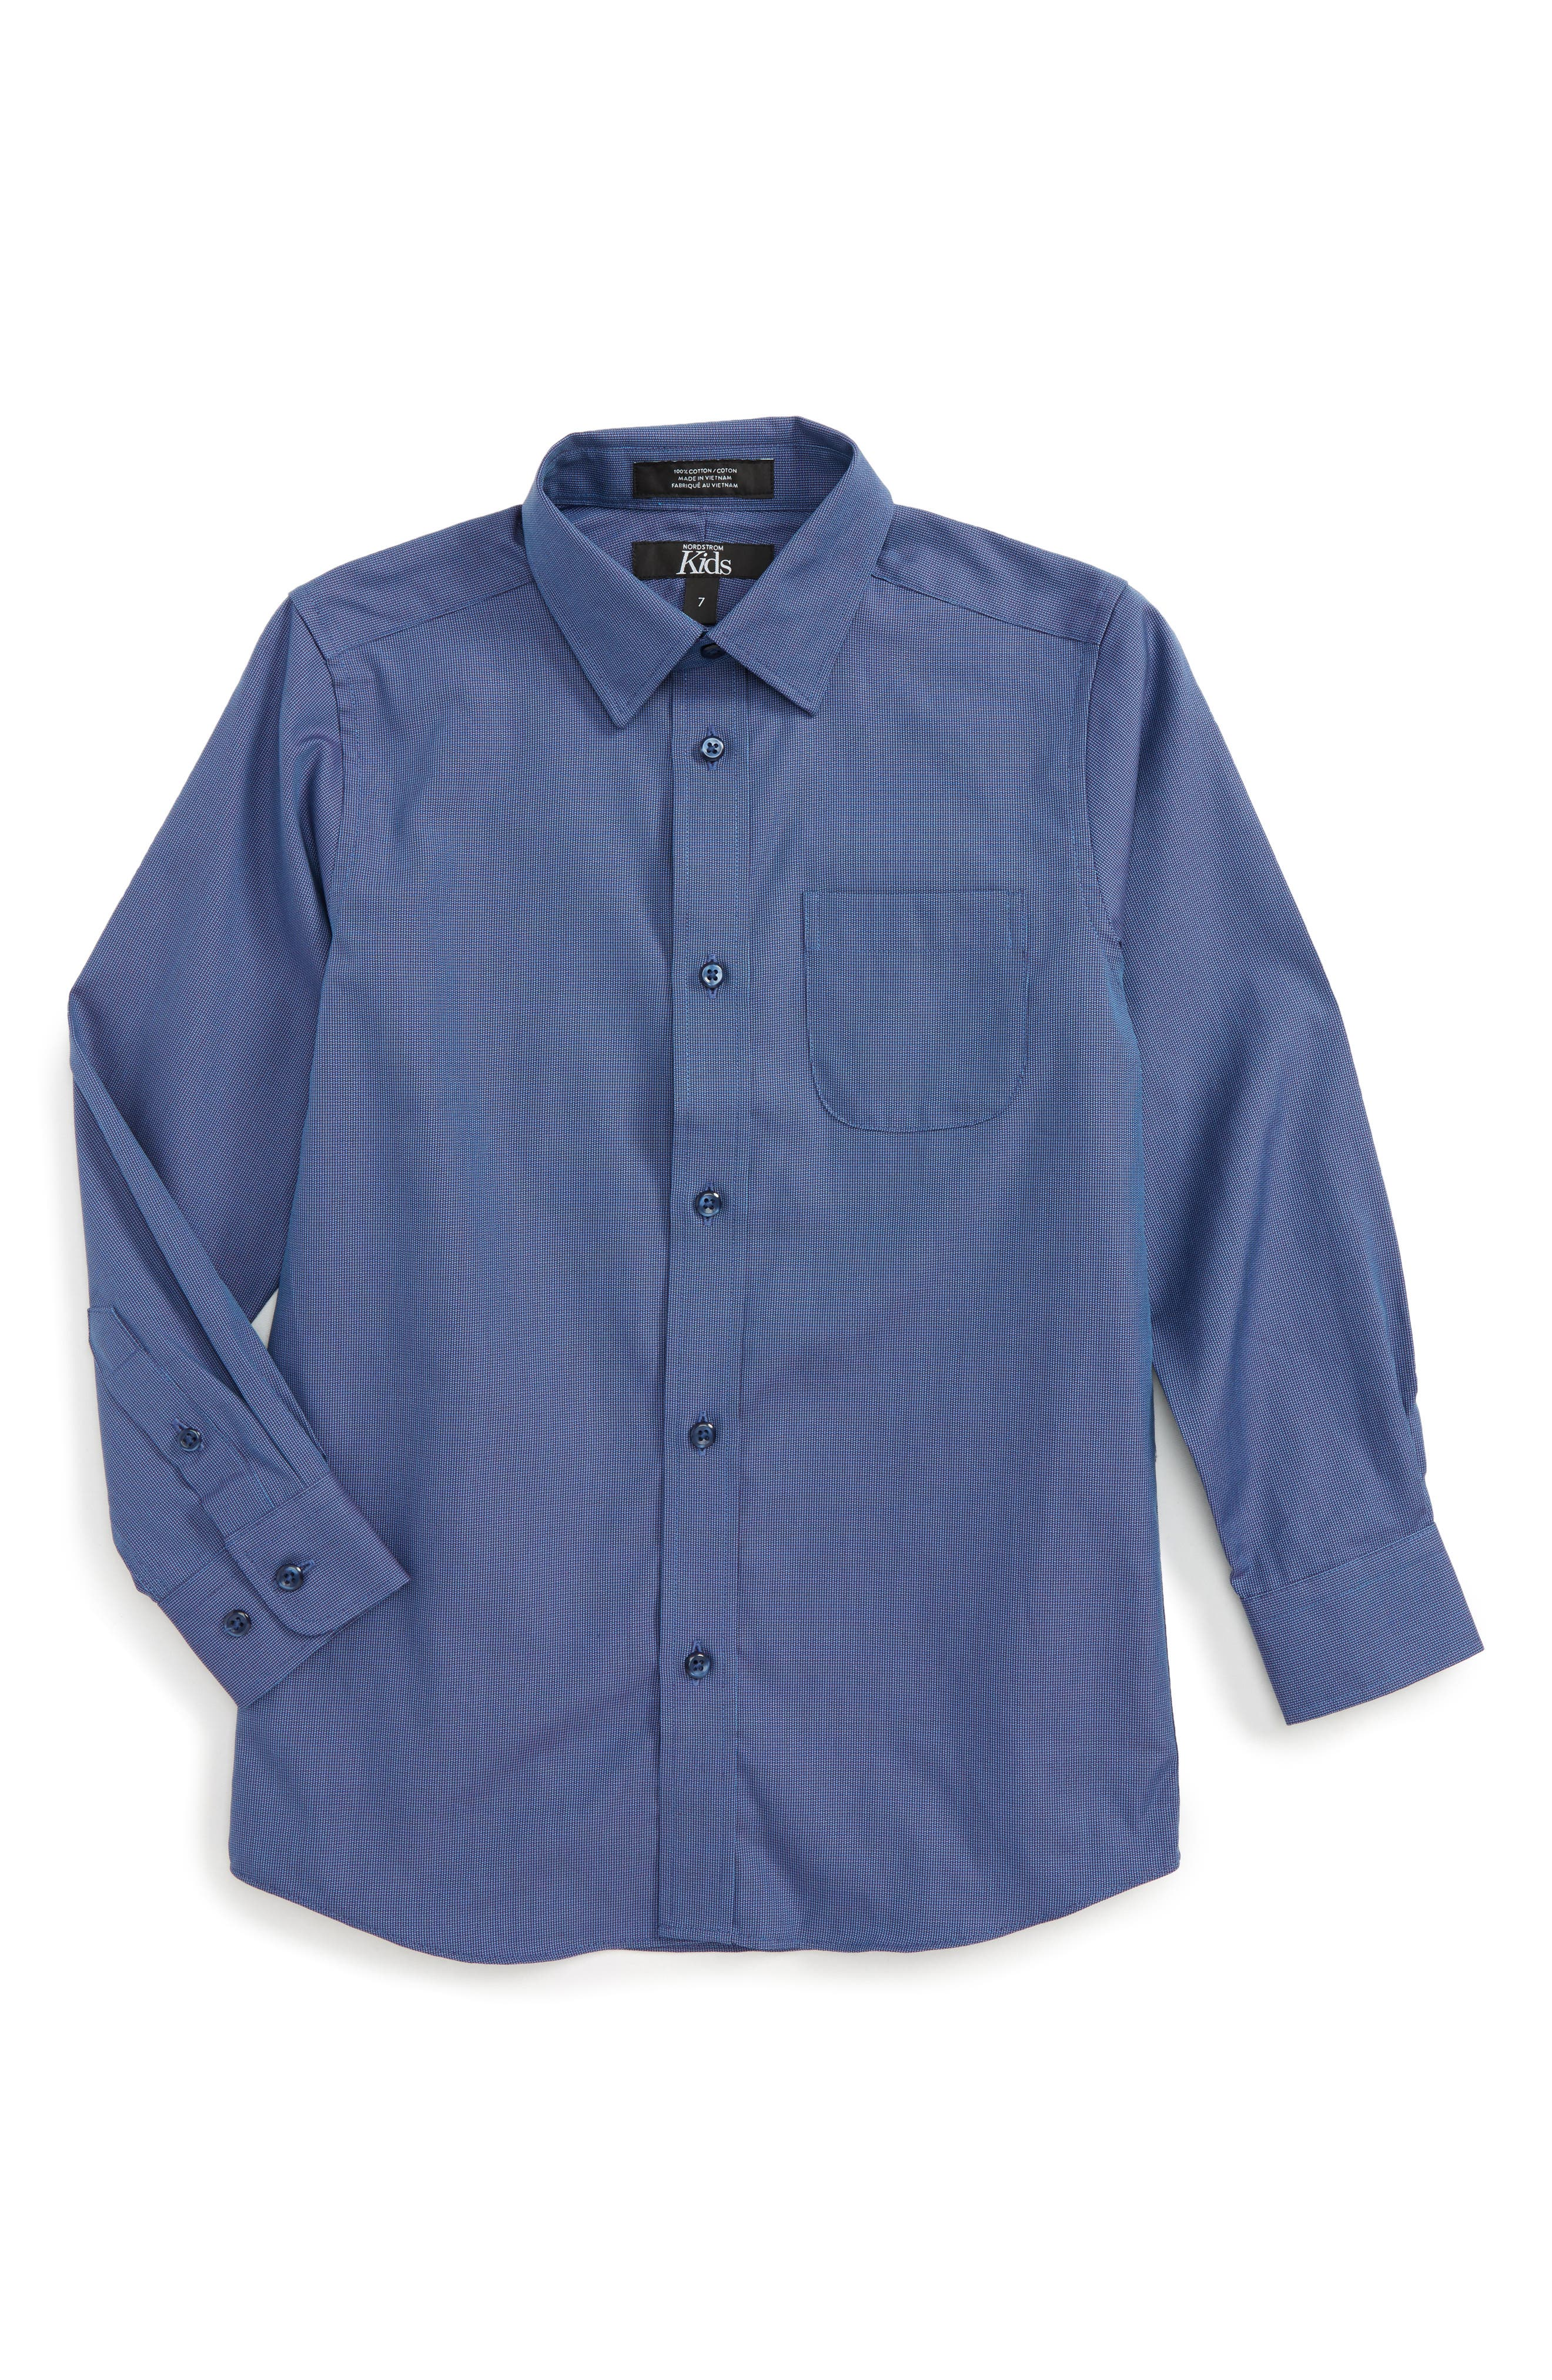 Alternate Image 1 Selected - Nordstrom Patriot Cotton Poplin Dress Shirt (Toddler Boys & Little Boys)